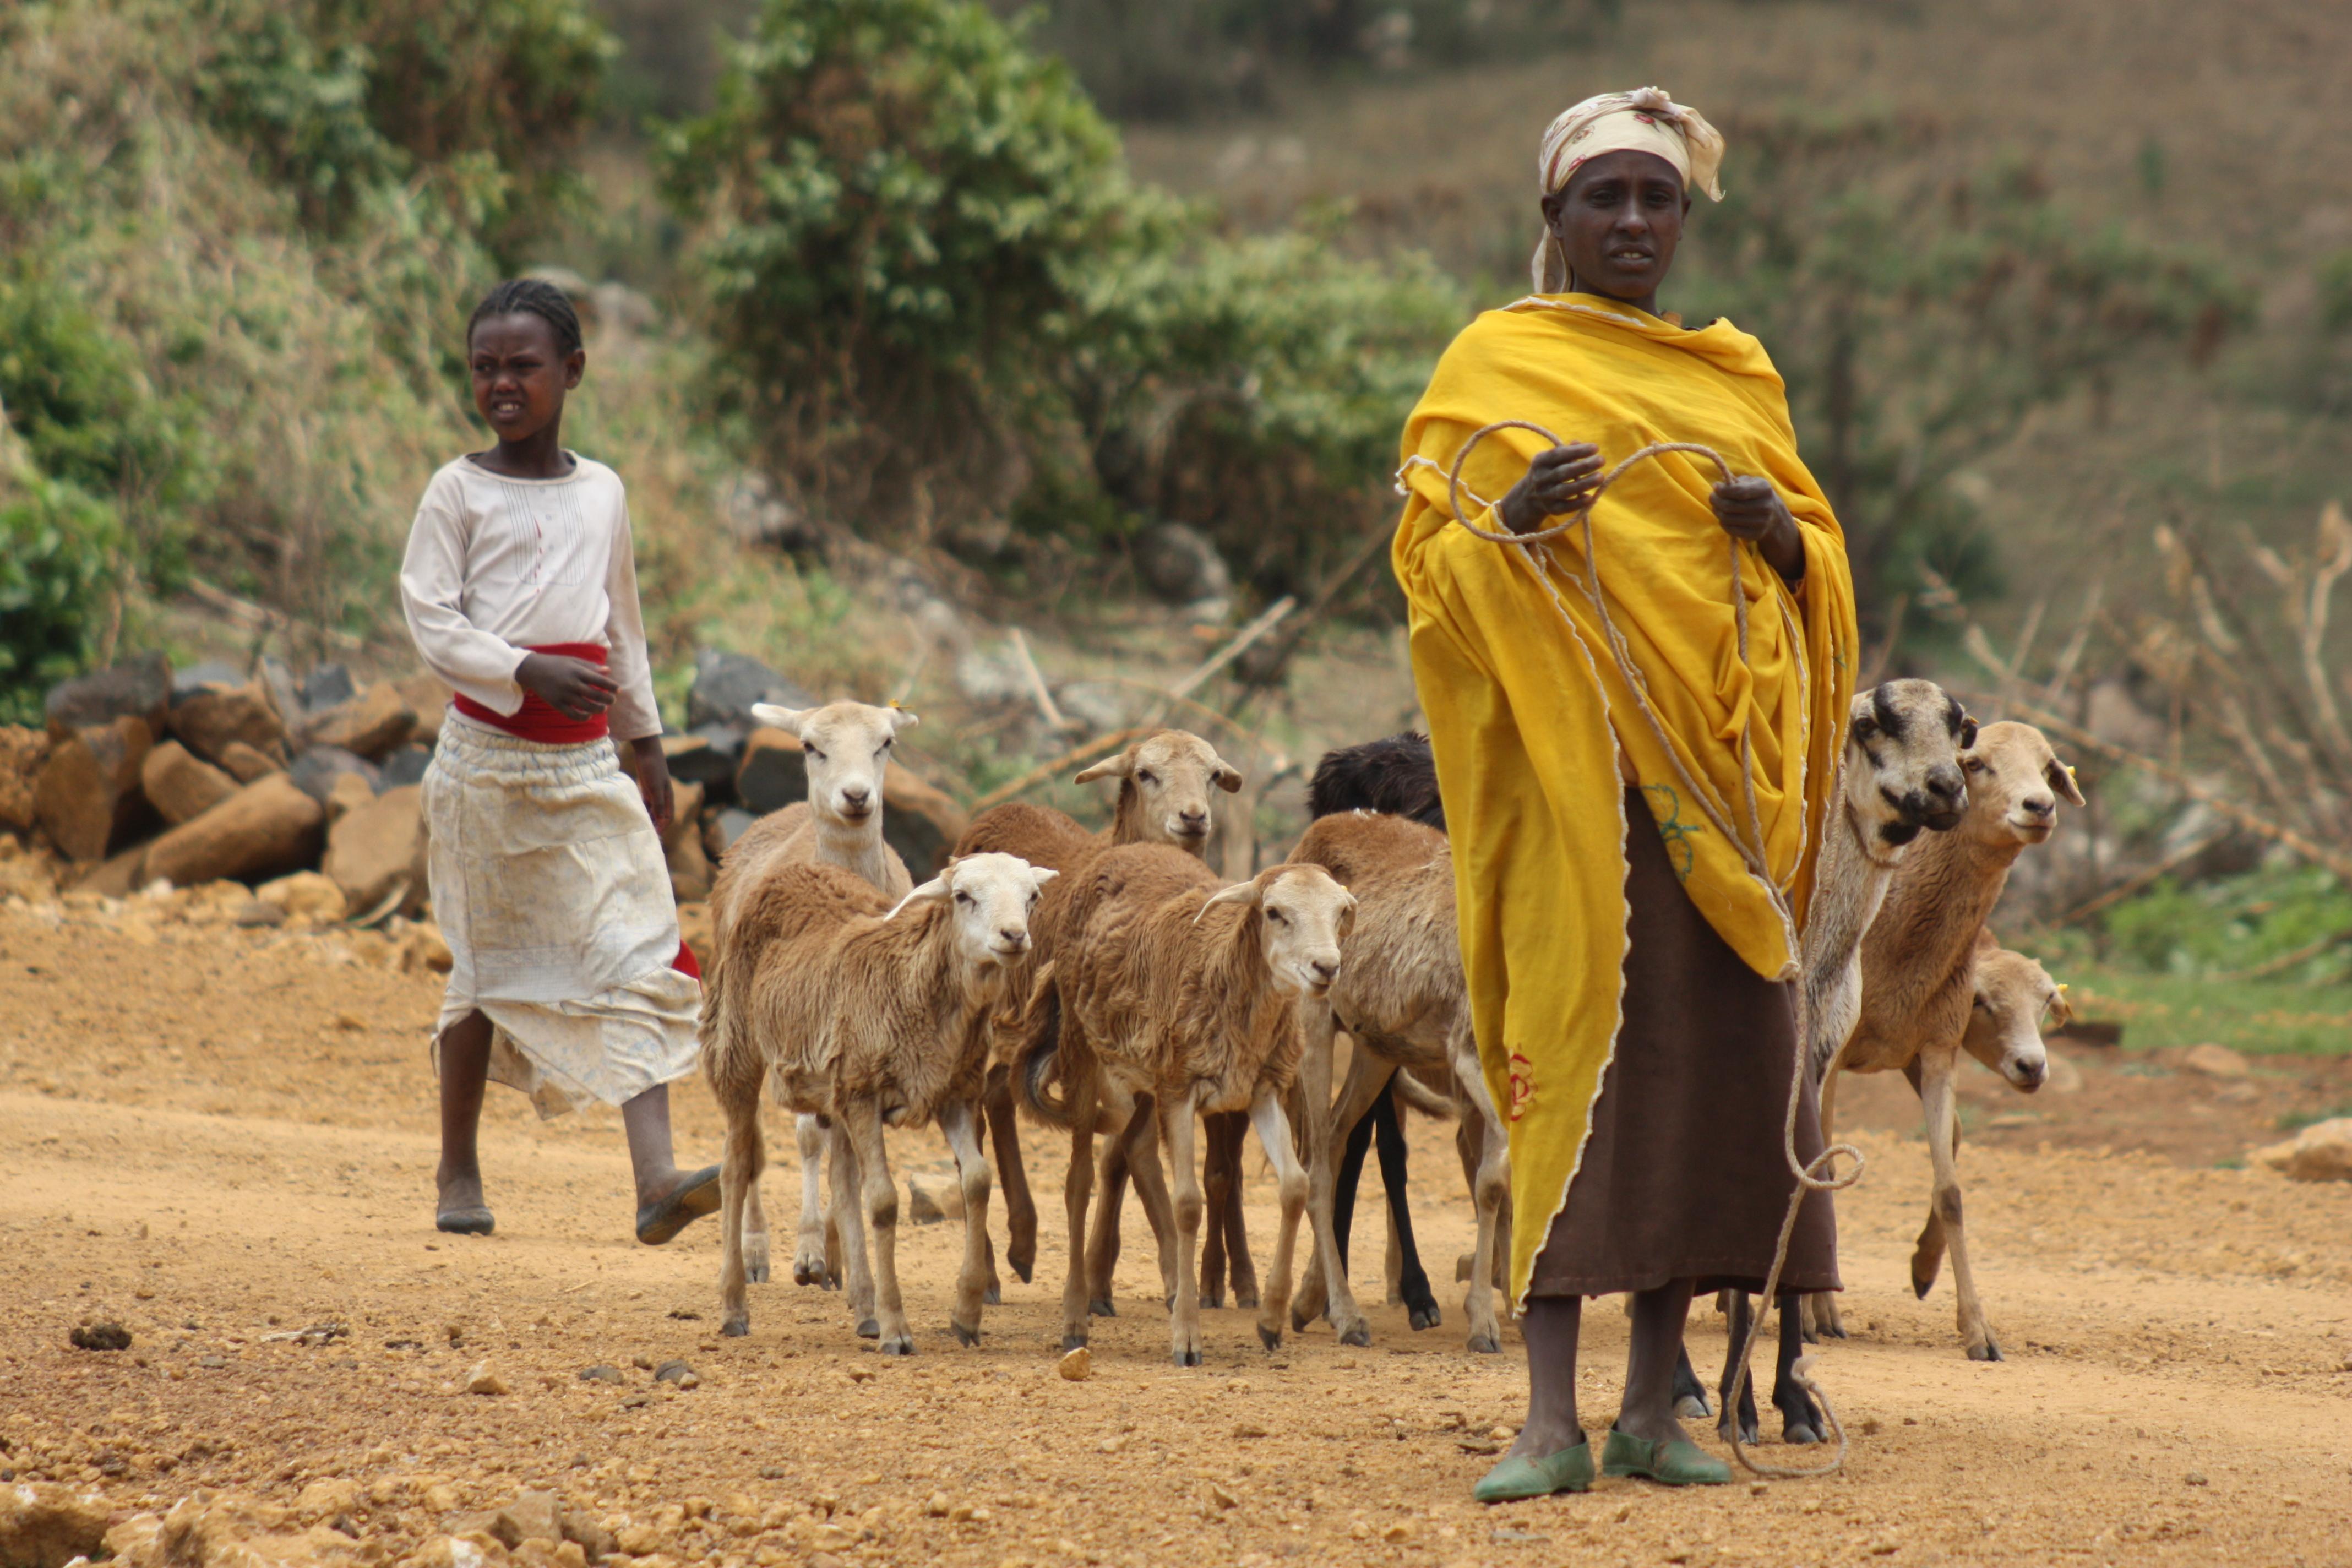 Taking sheep for disease testing in Ethiopia (photo credit: ILRI/Barbara Wieland)